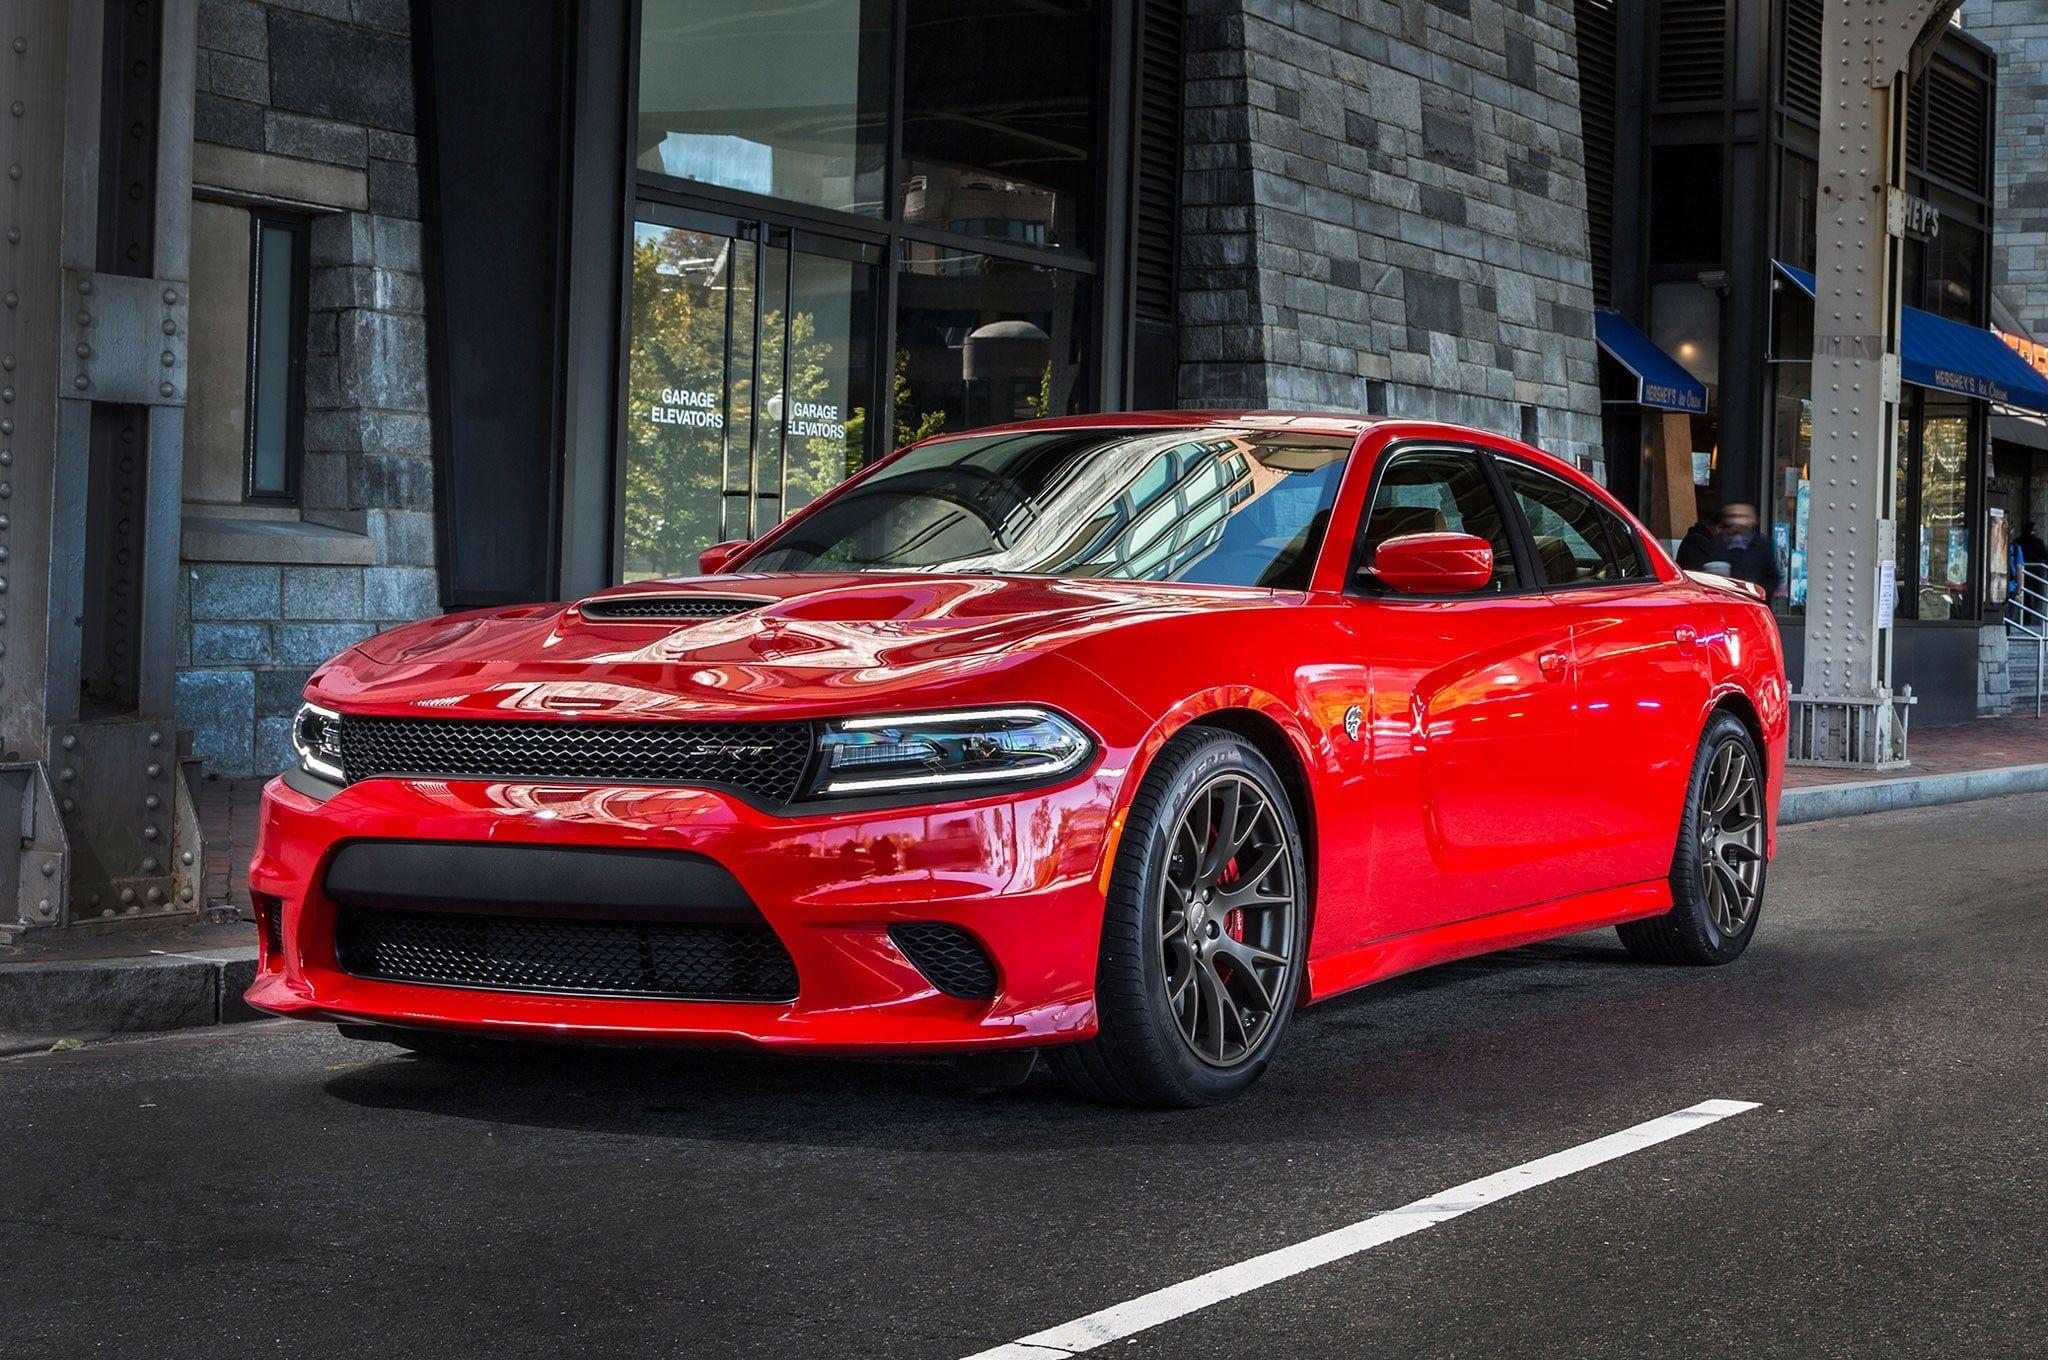 Cele Mai Bune Masini Sport Sub 30k 2018 Dodge Charger Srt8 Red Dodge Charger Hellcat Dodge Charger Dodge Charger Srt8